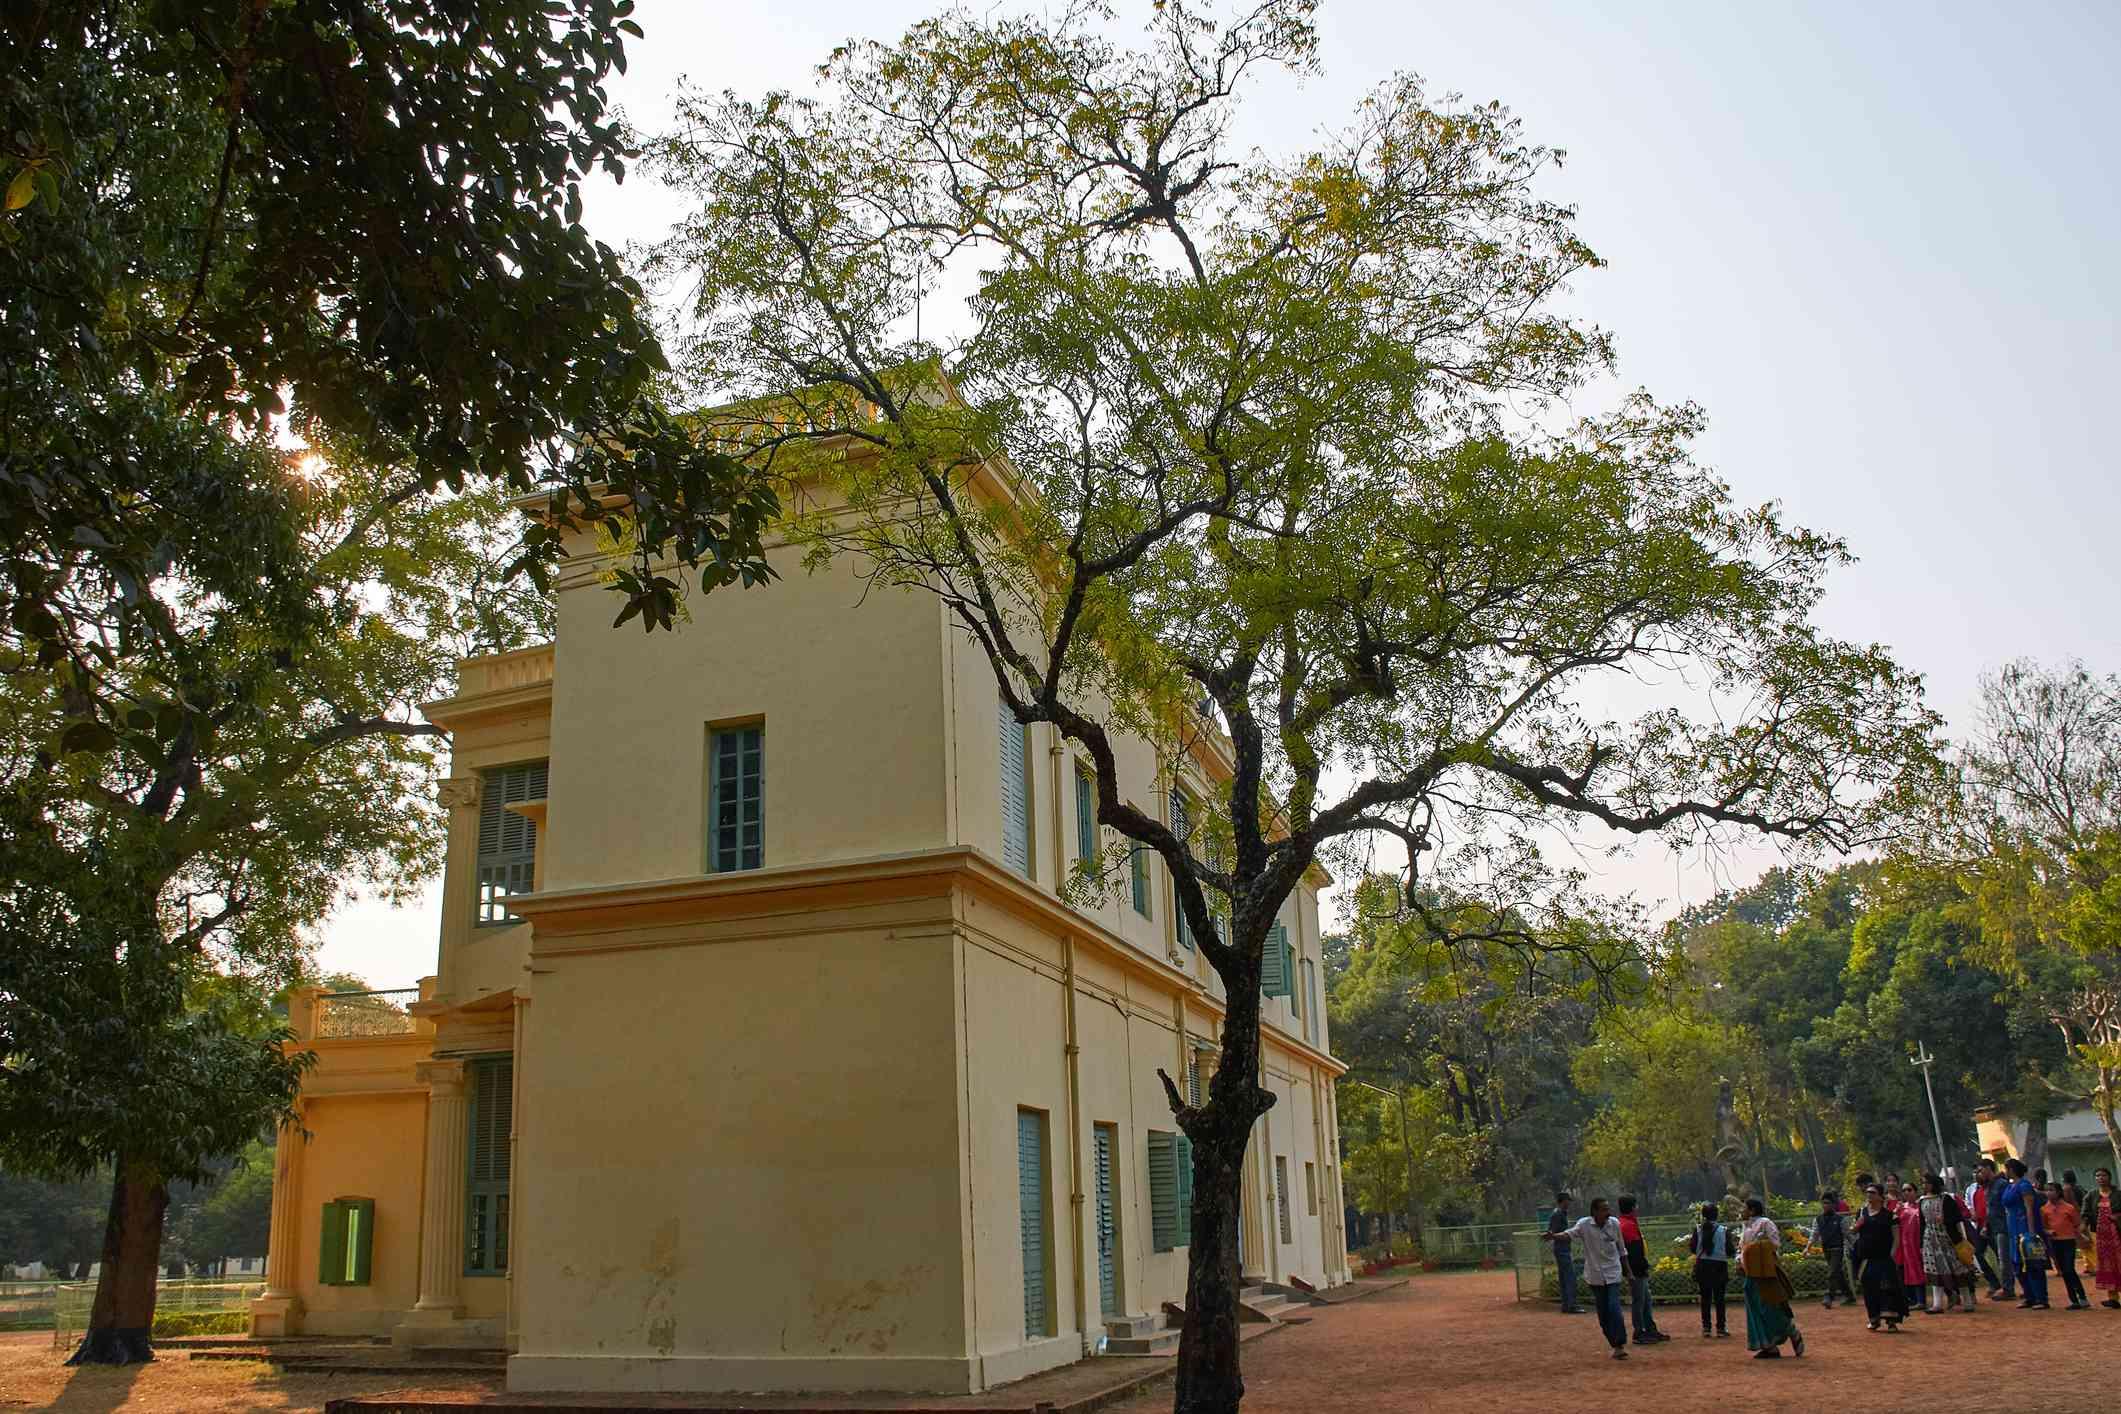 Santiniketan Griha (house), one of the oldest building inside the Visva-Bharati University campus, at Shantiniketan.